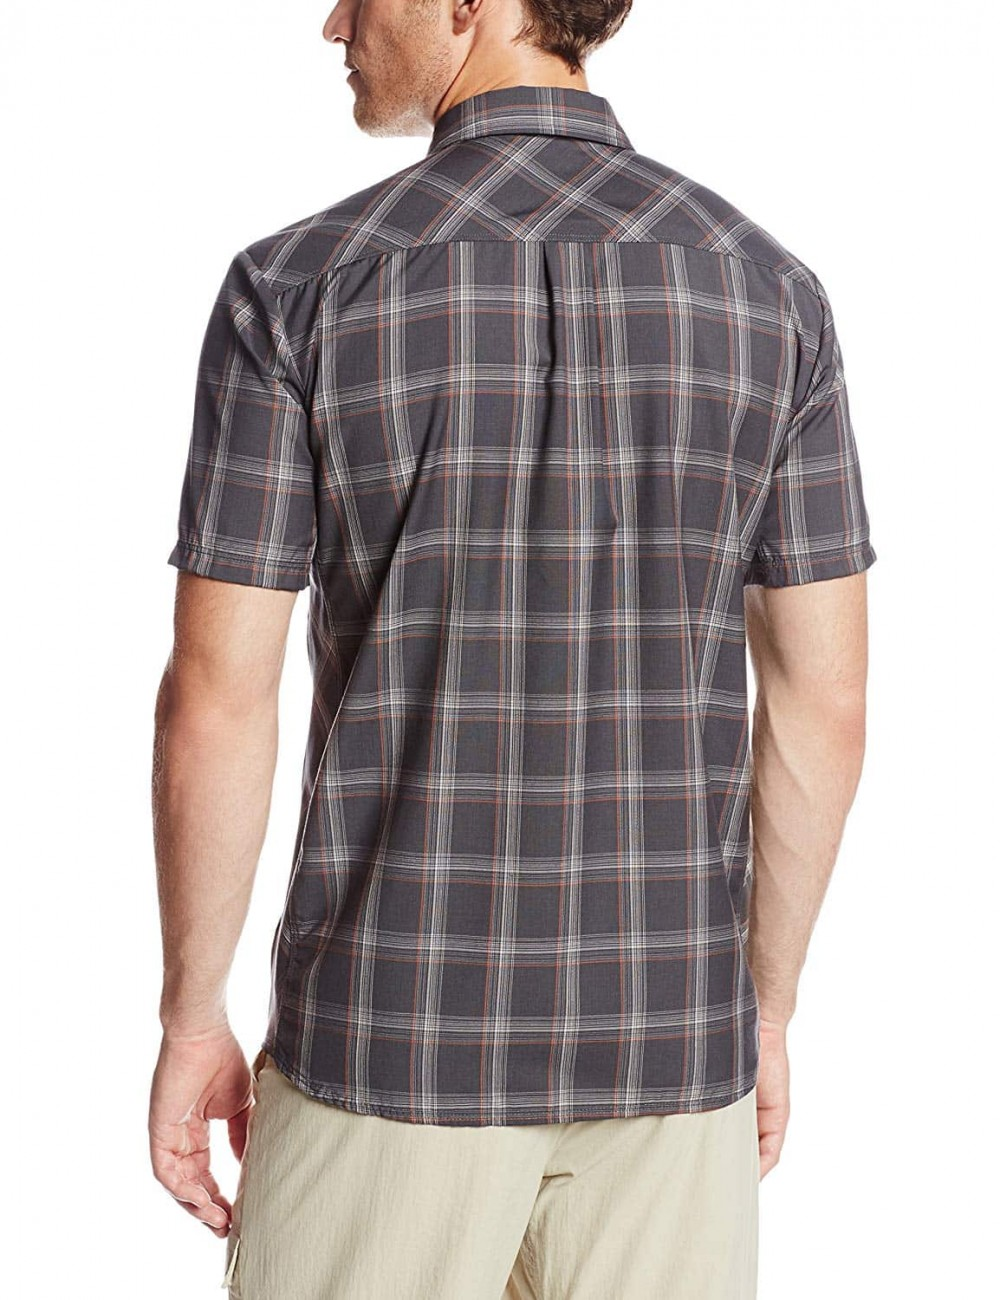 Рубашка ICEBREAKER departure ultralight 150 shirt (размер L) - 1